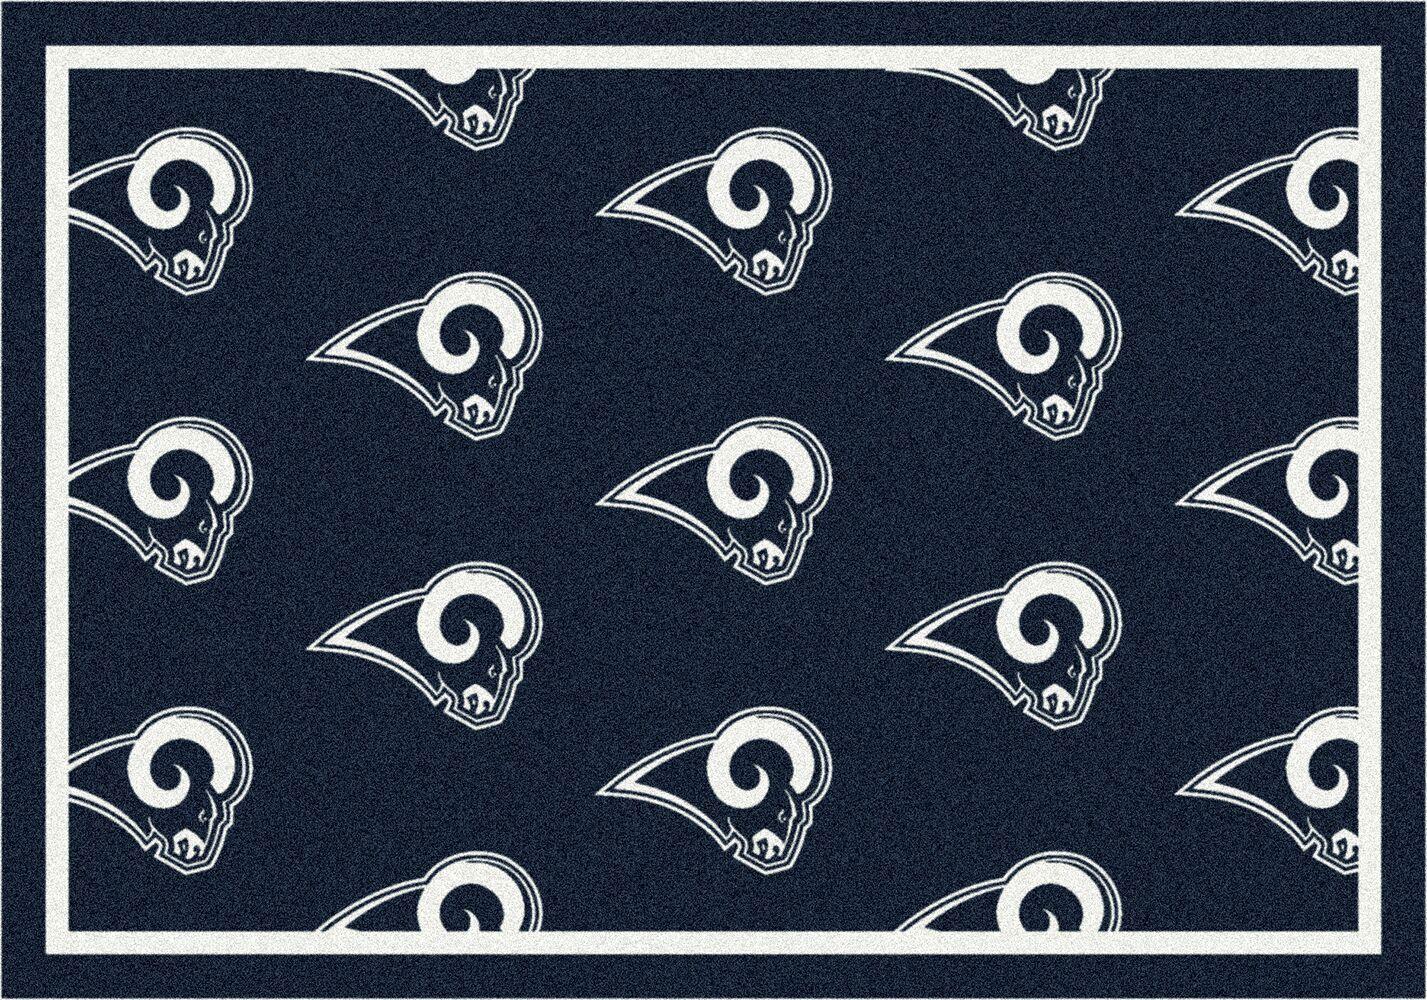 Los Angeles Rams Reapeting Logo Area Rug